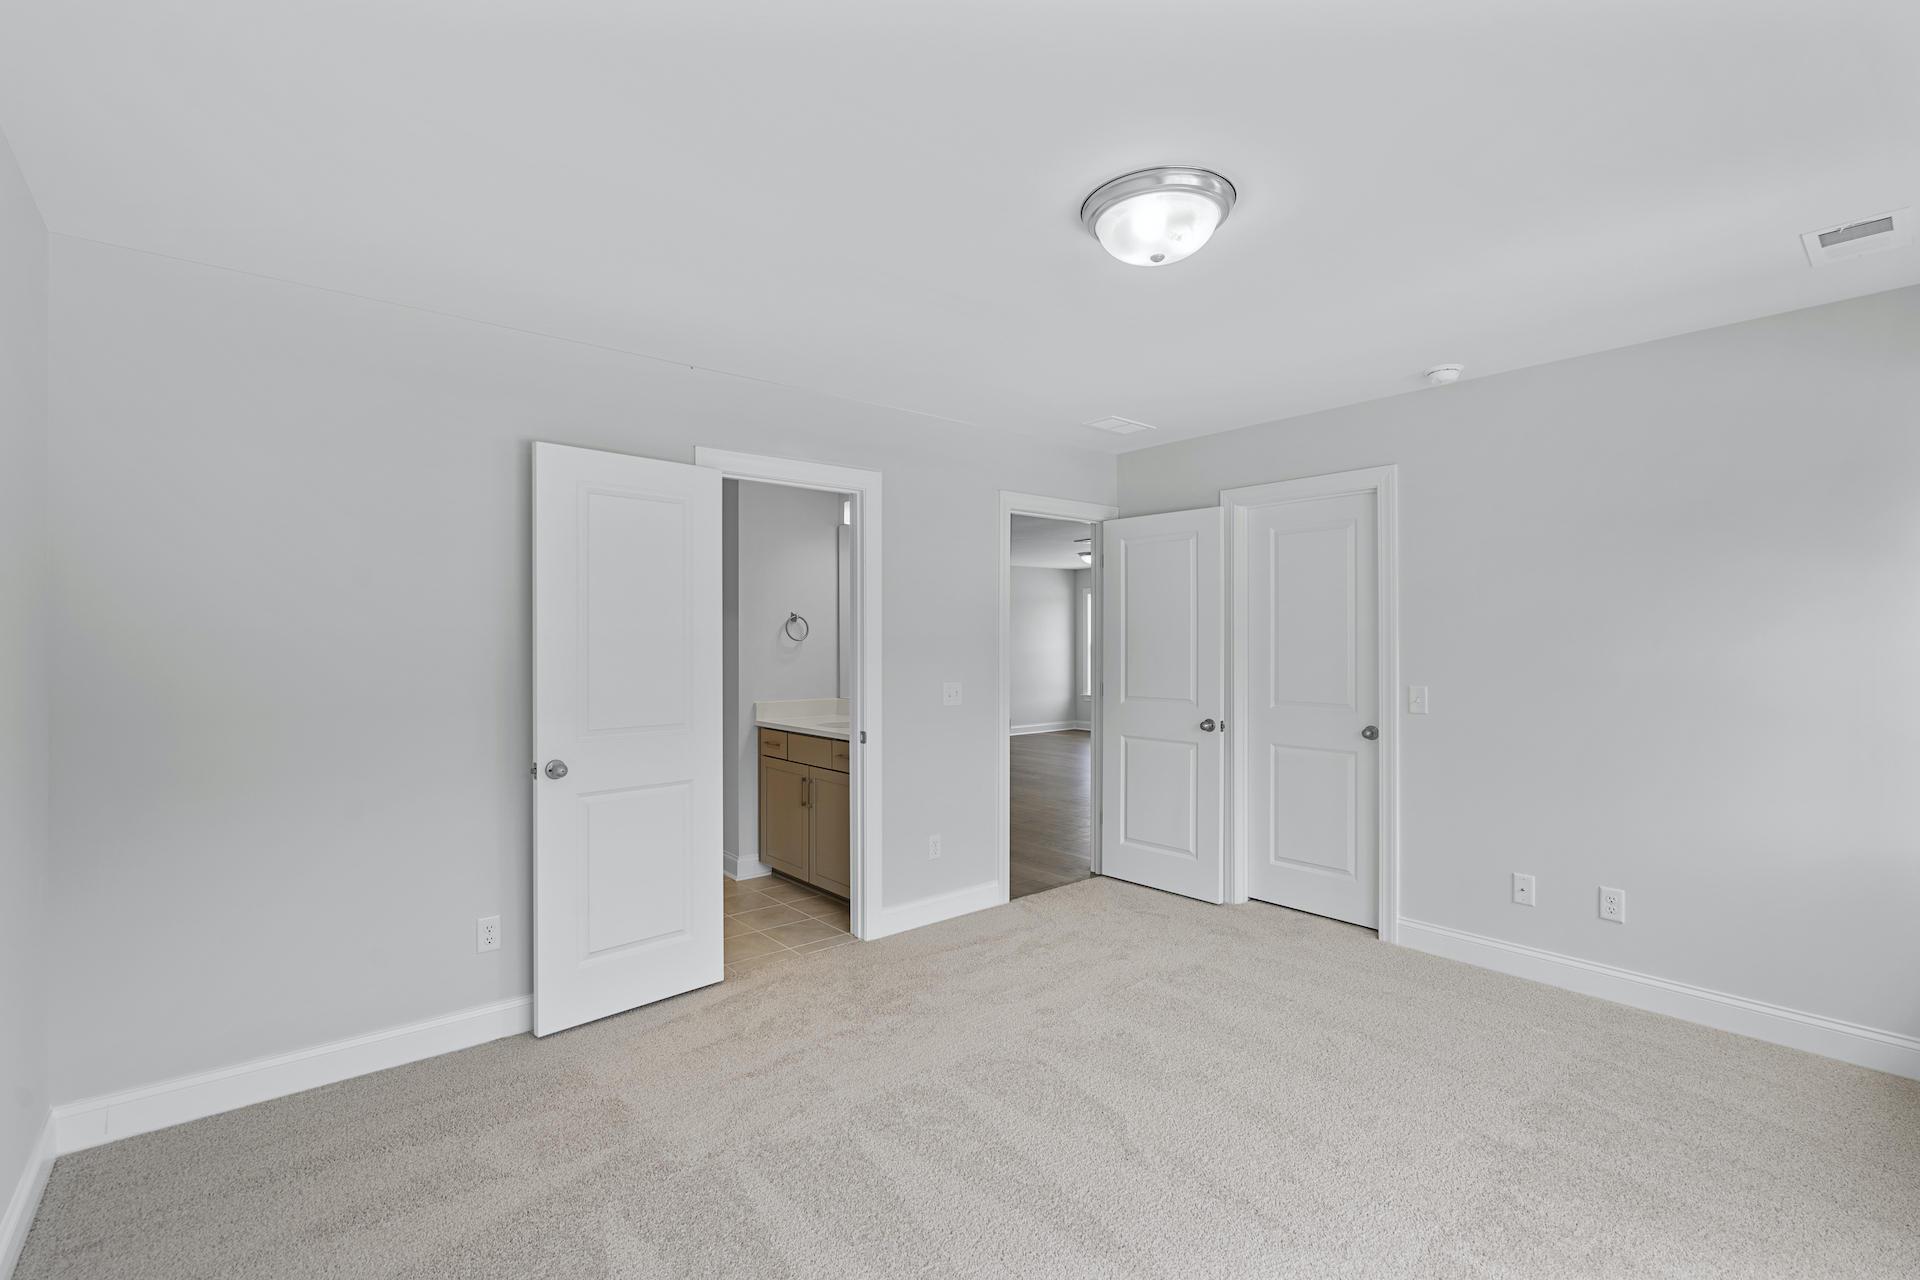 Drayton Oaks Homes For Sale - 105 Plowden Mill, Summerville, SC - 4